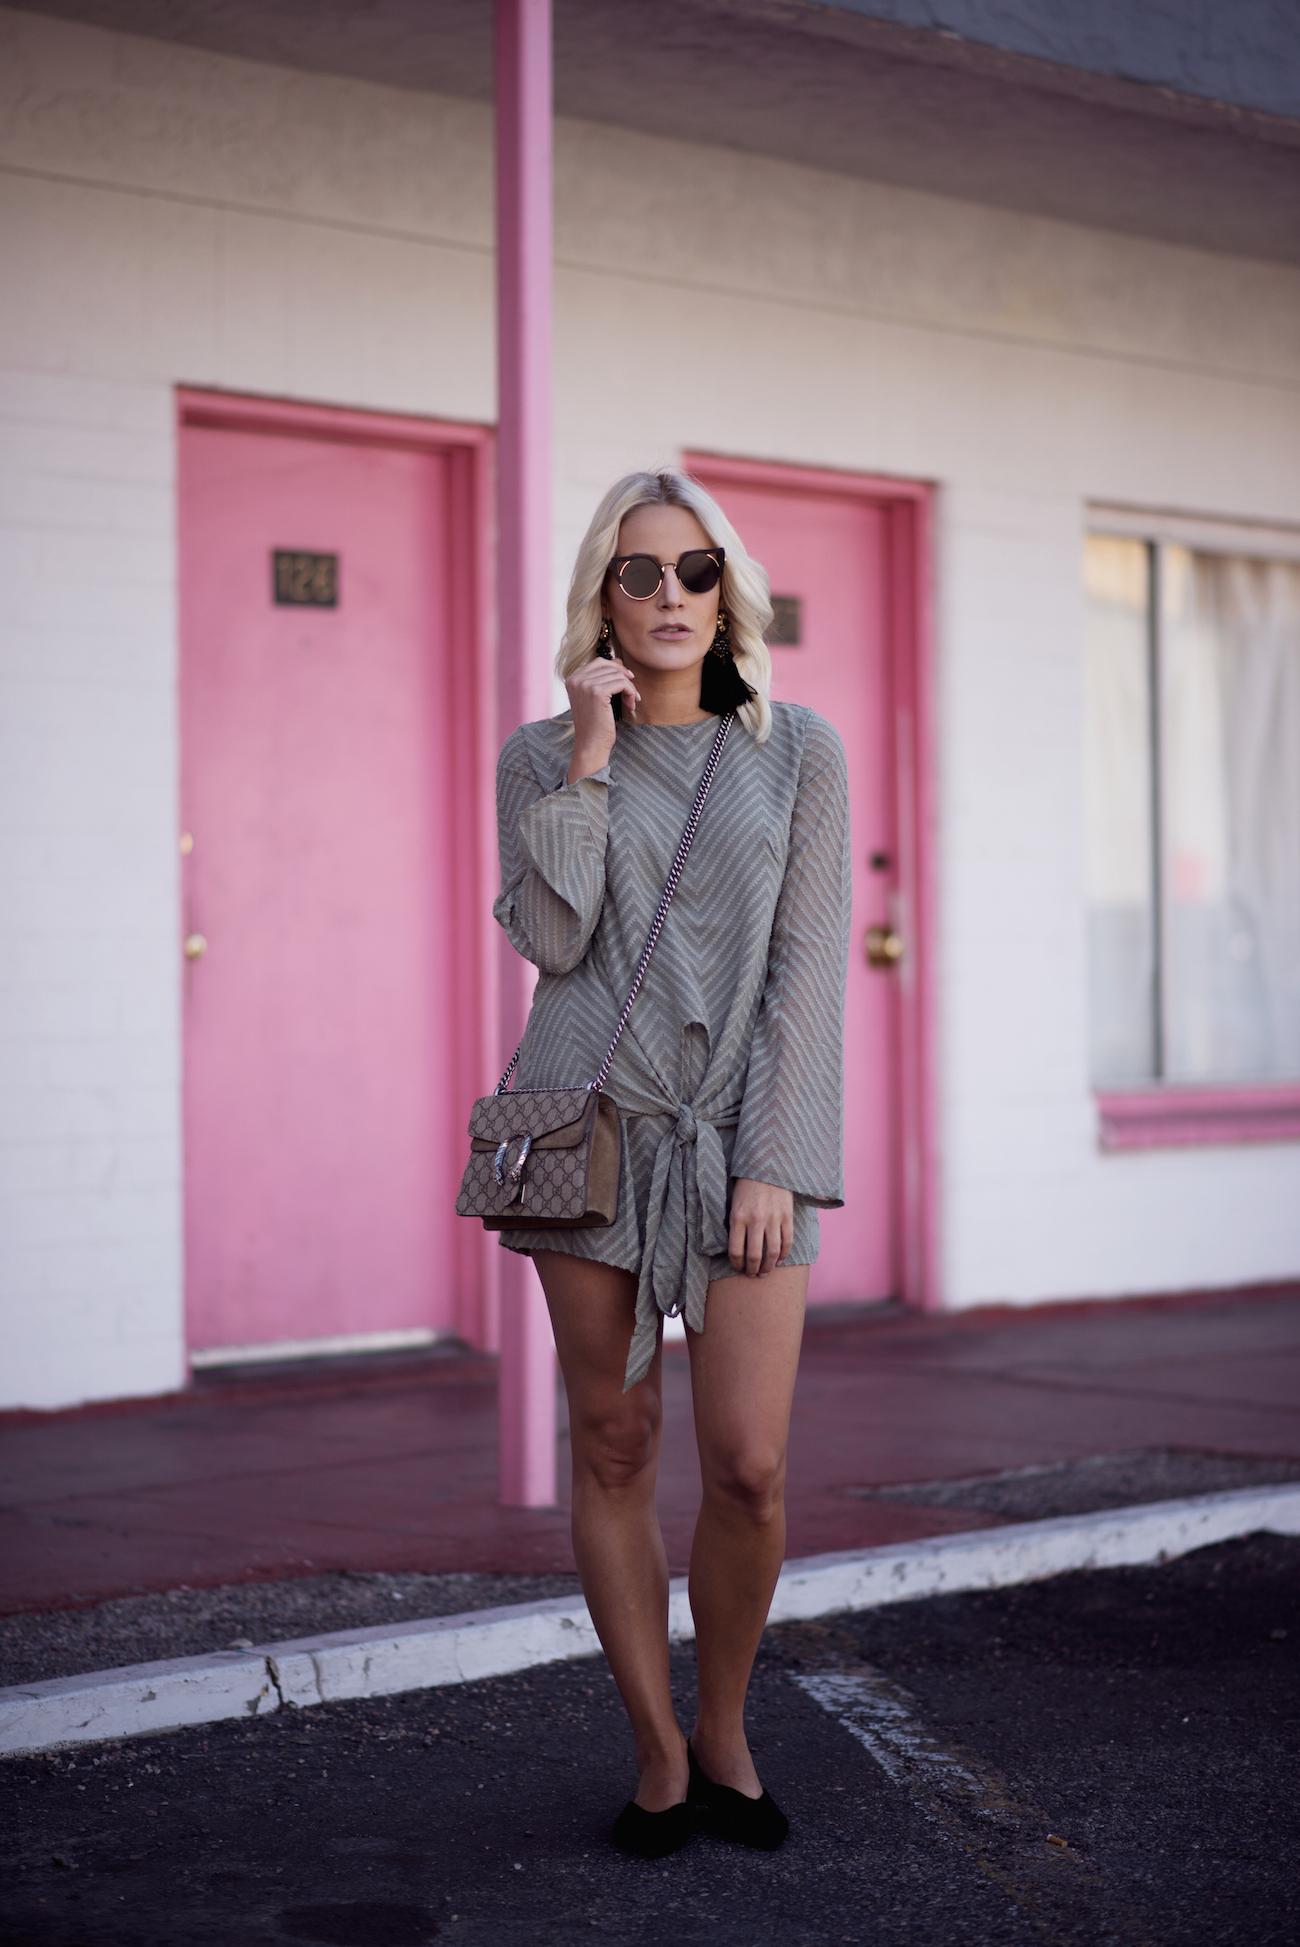 FashionBlogger-Blogger-Munich-Sequinsophia-GucciDionysus-Jumpsuite-LasVegas-2-LIN_5647